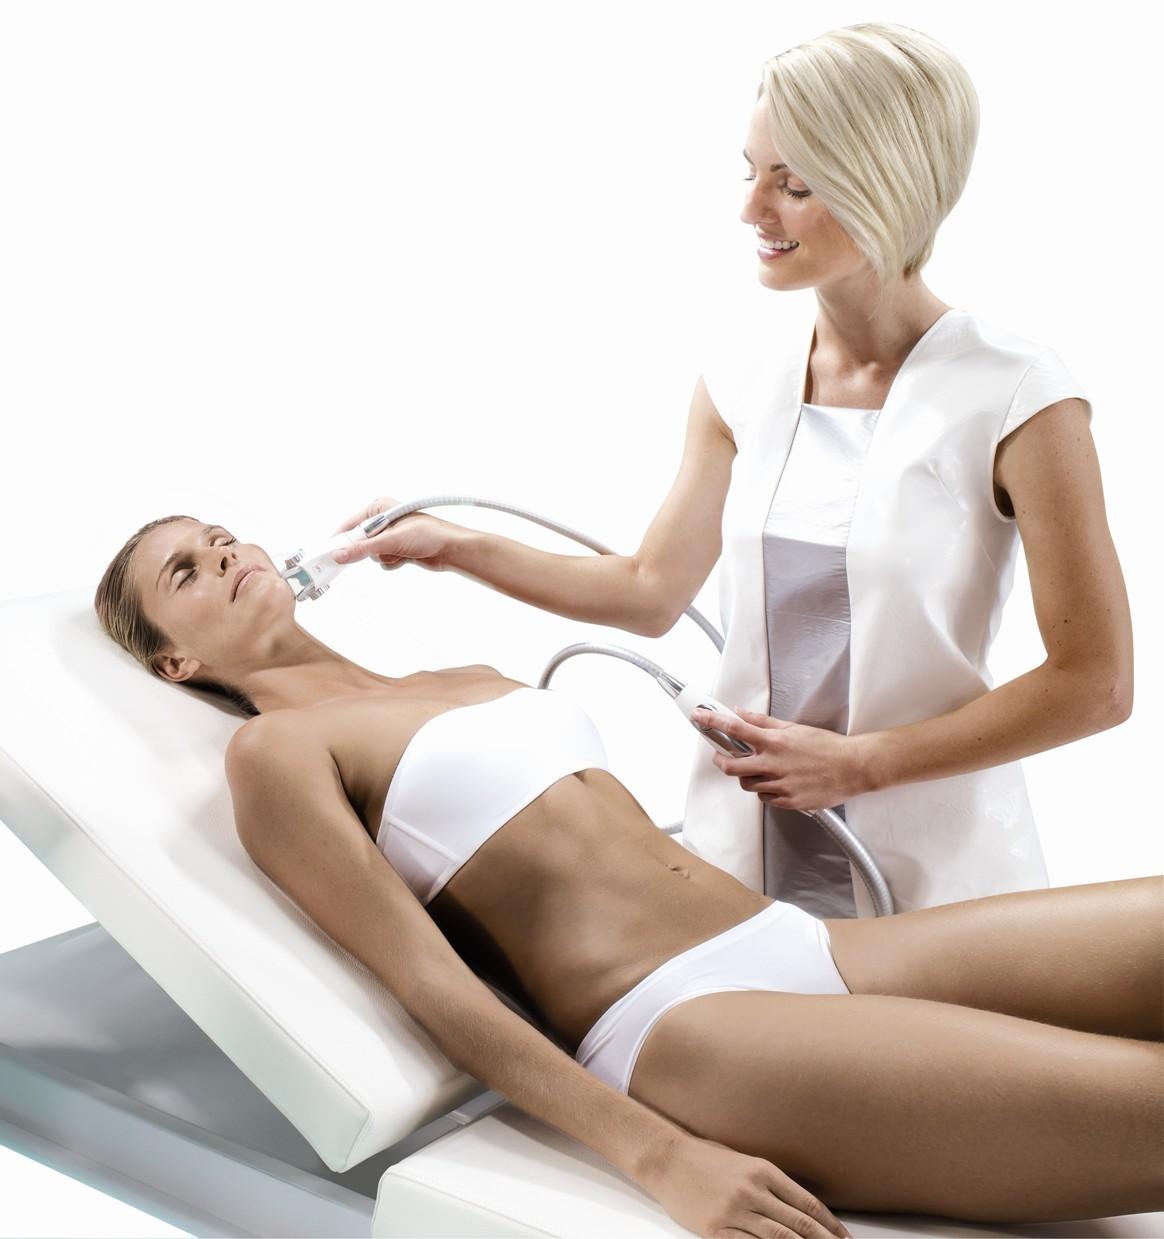 treatment_face_woman_to_woman_xtranet.jpg